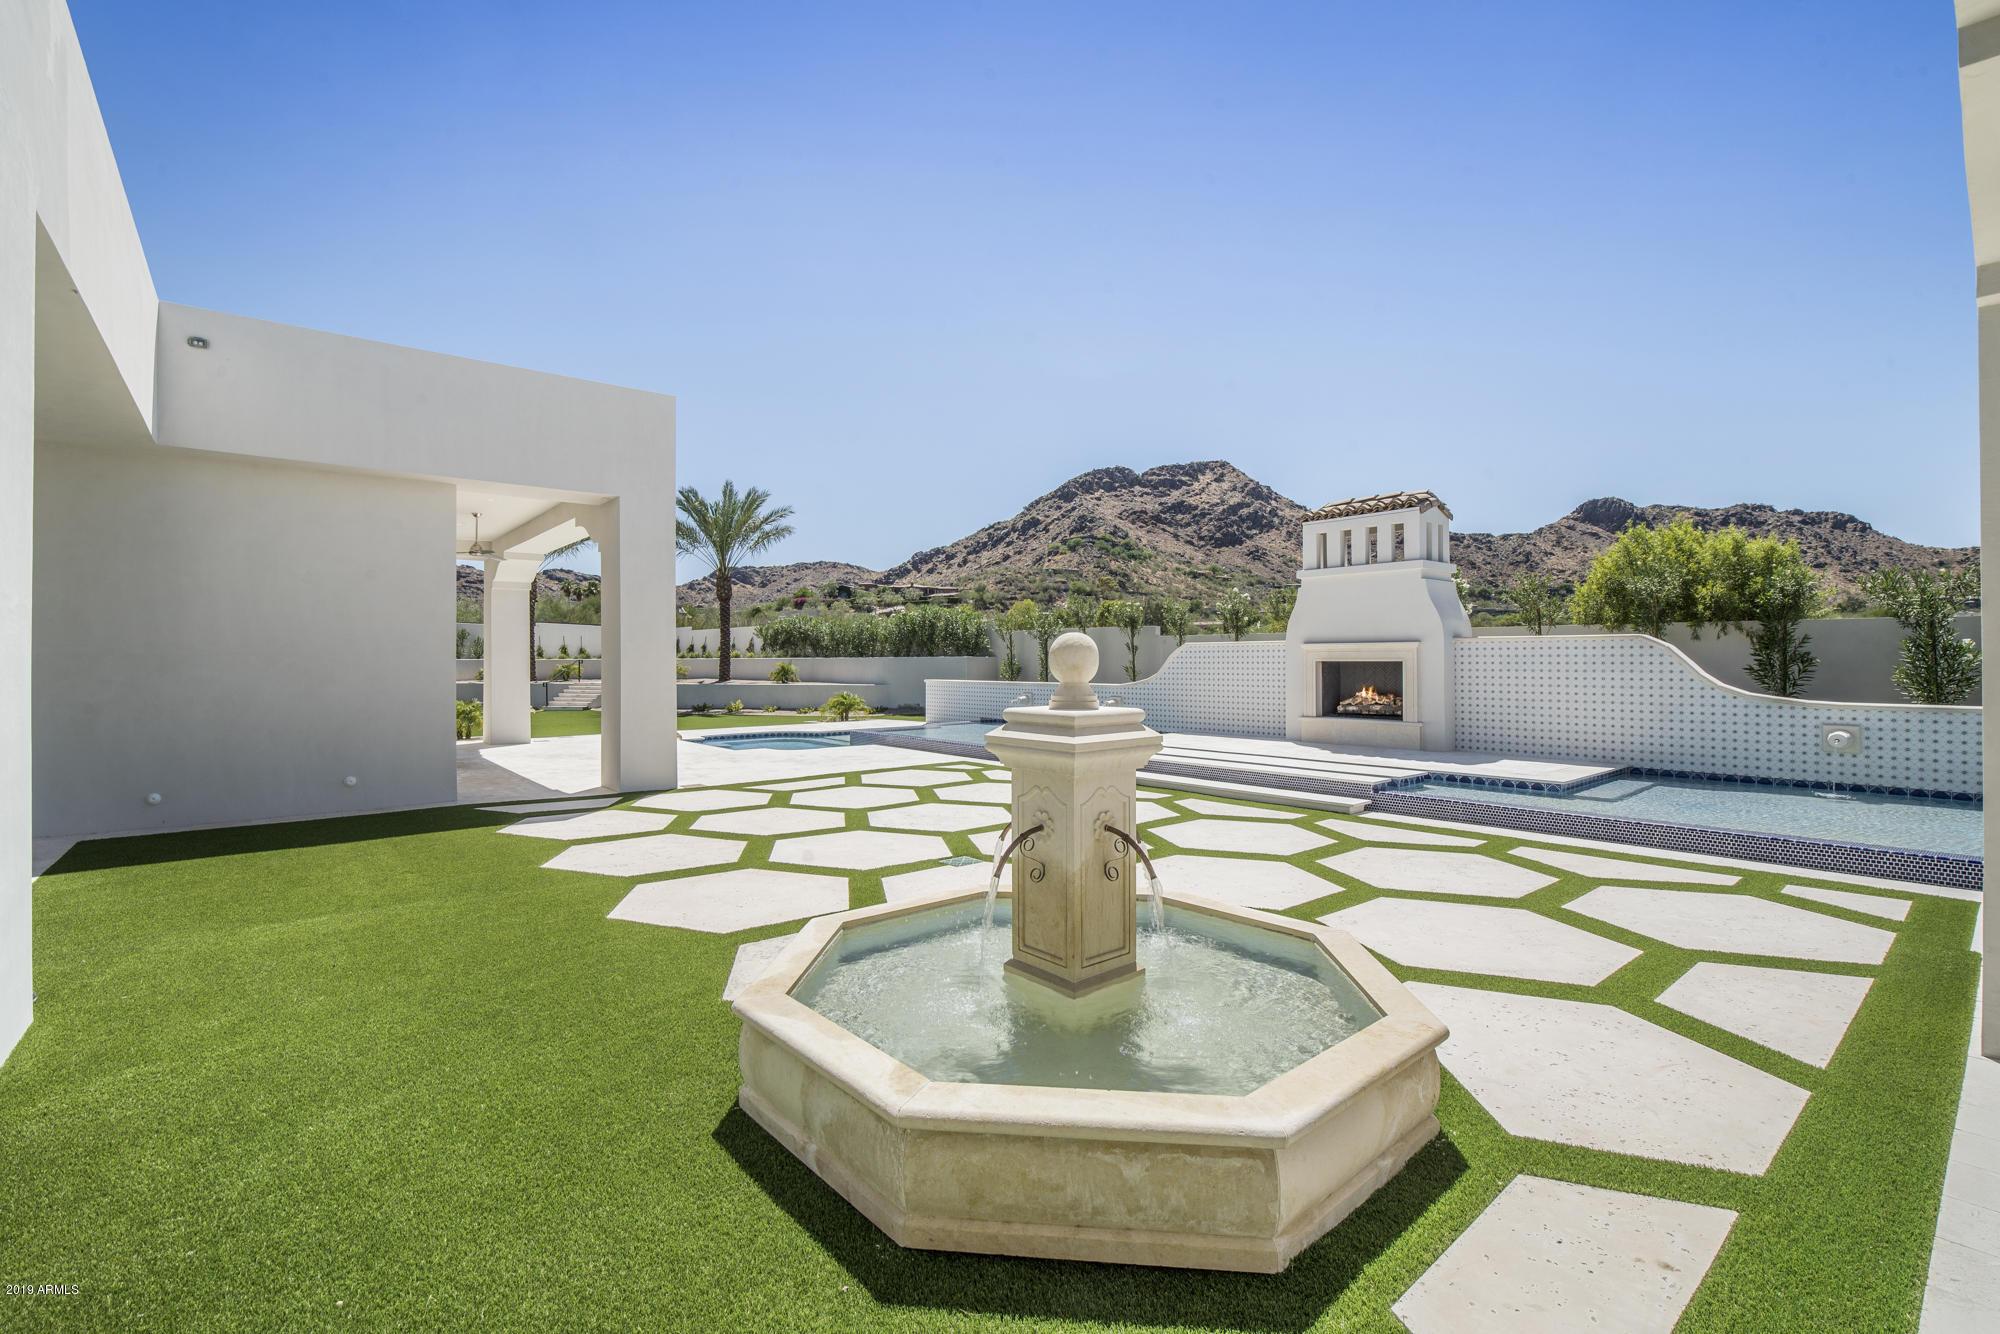 MLS 5718898 6208 E Bret Hills Drive, Paradise Valley, AZ Paradise Valley Horse Property for Sale